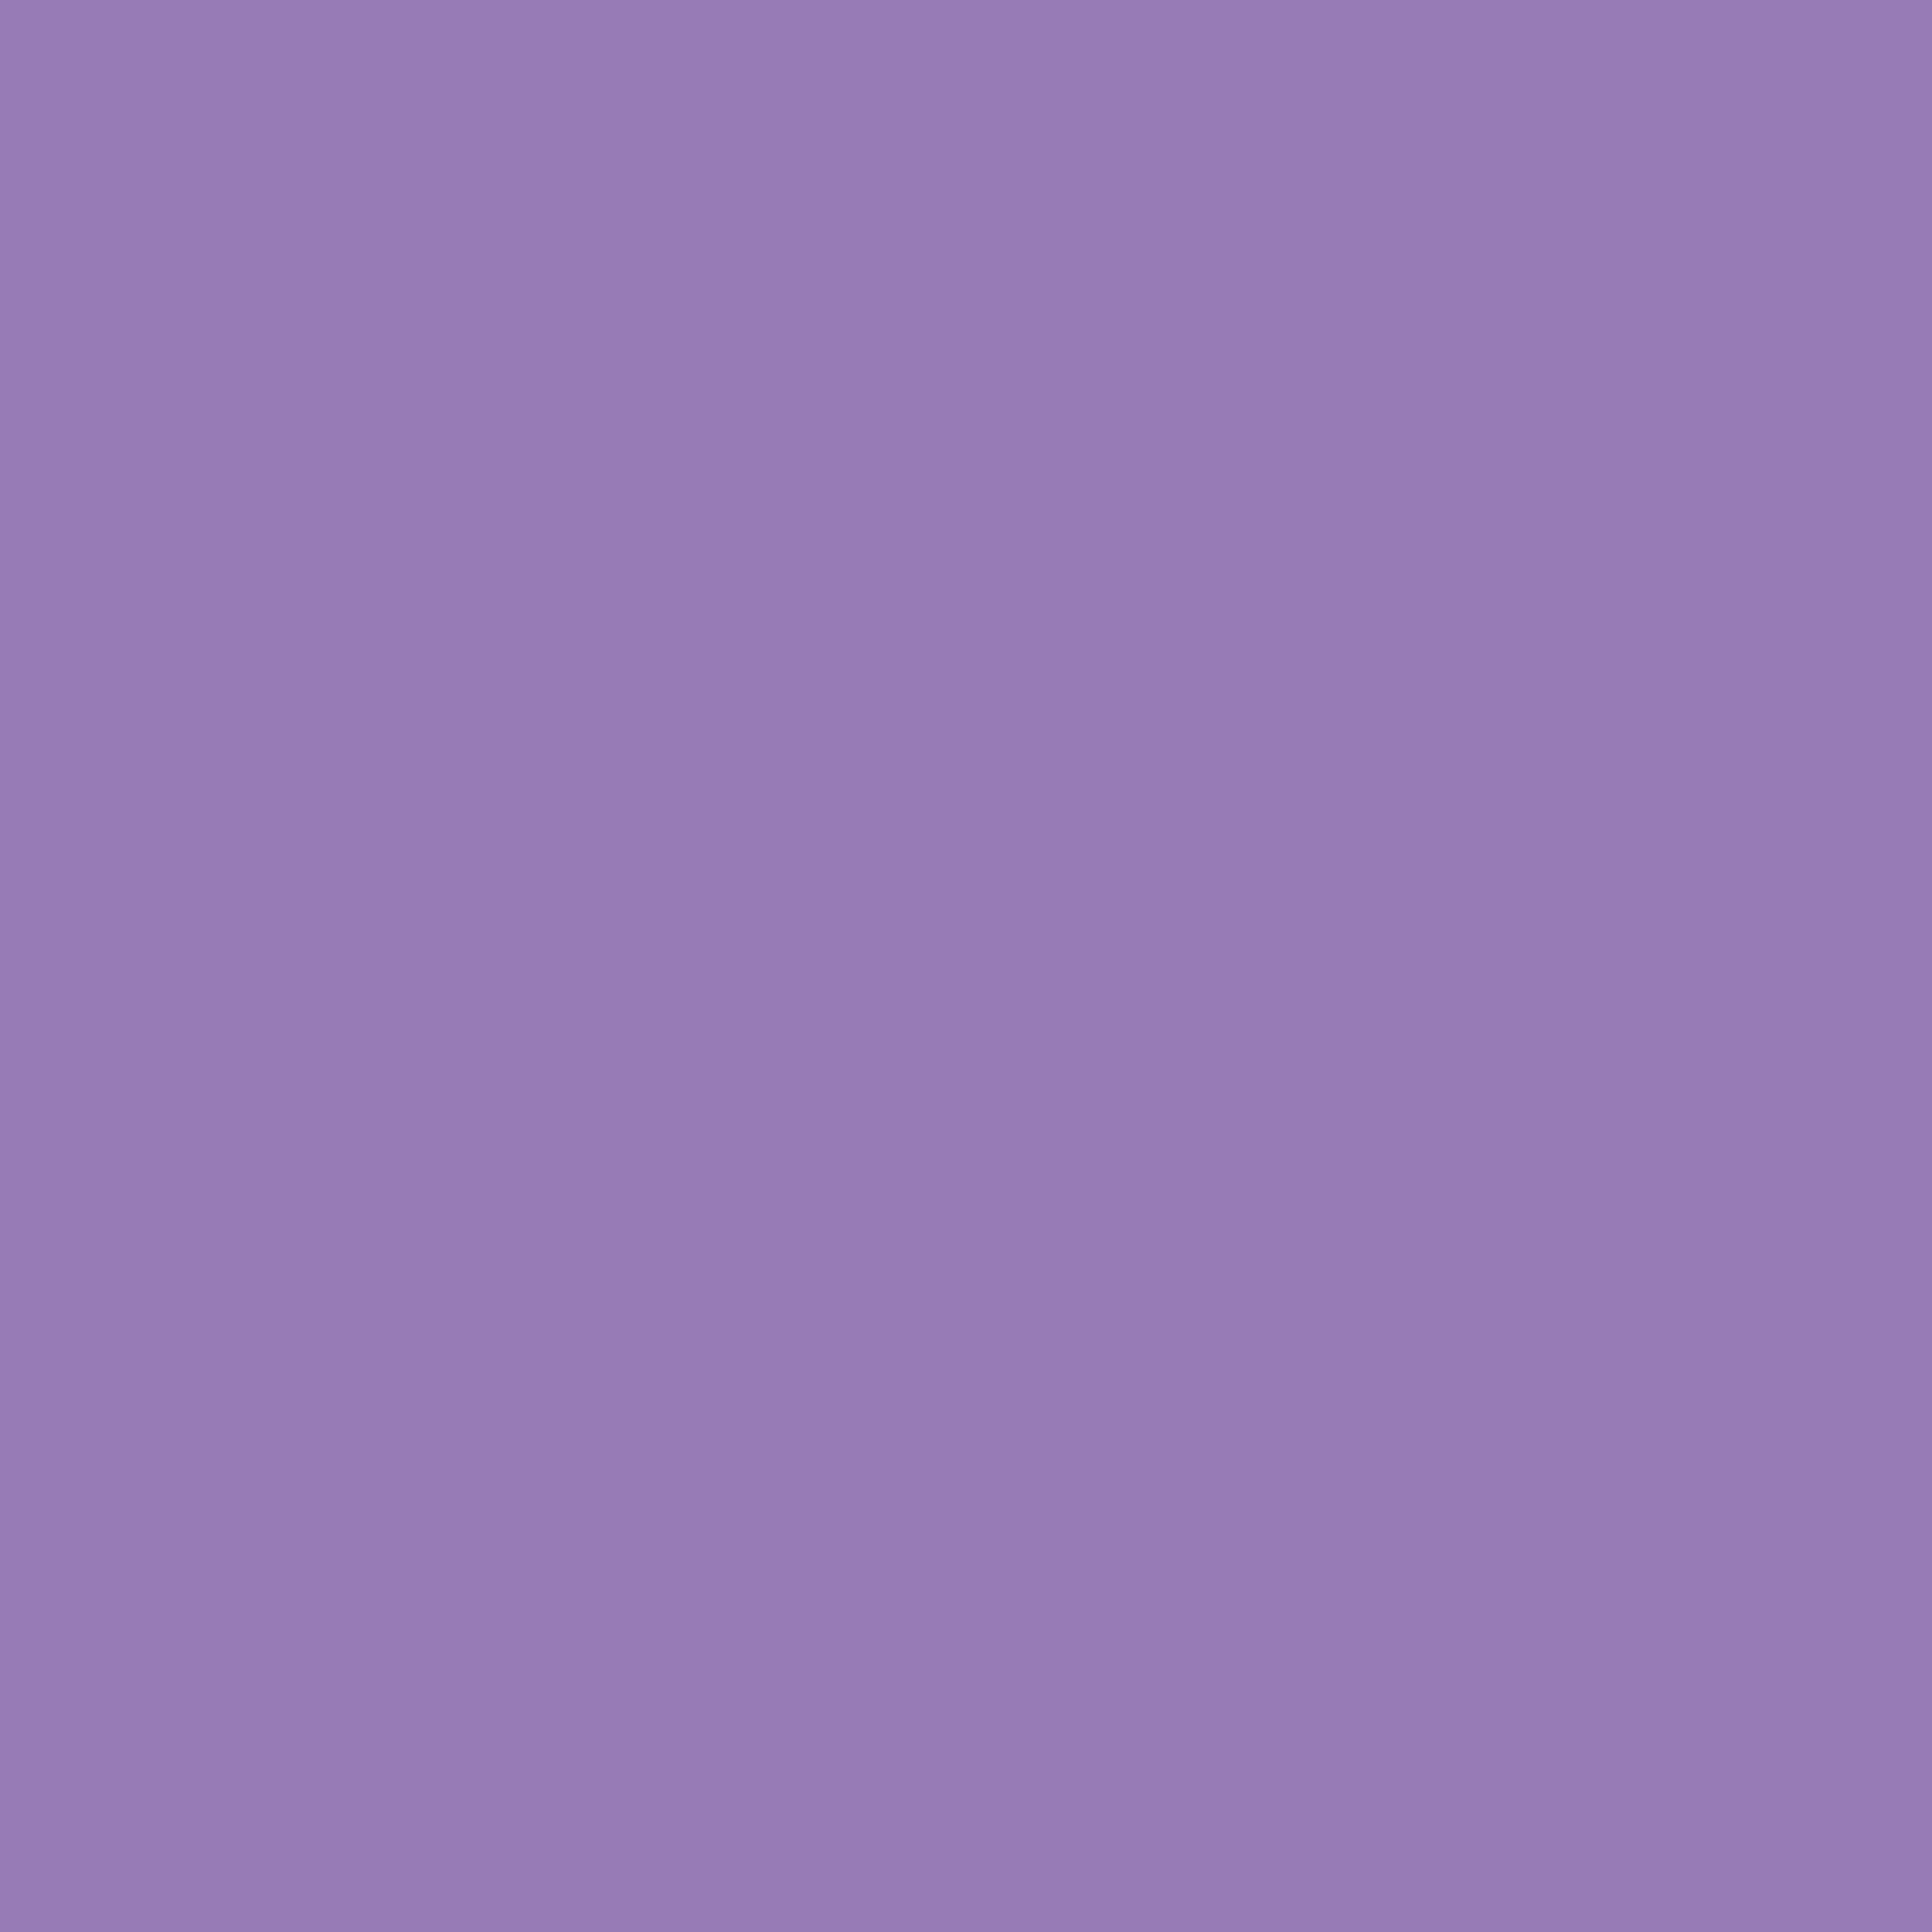 2732x2732 Lavender Purple Solid Color Background